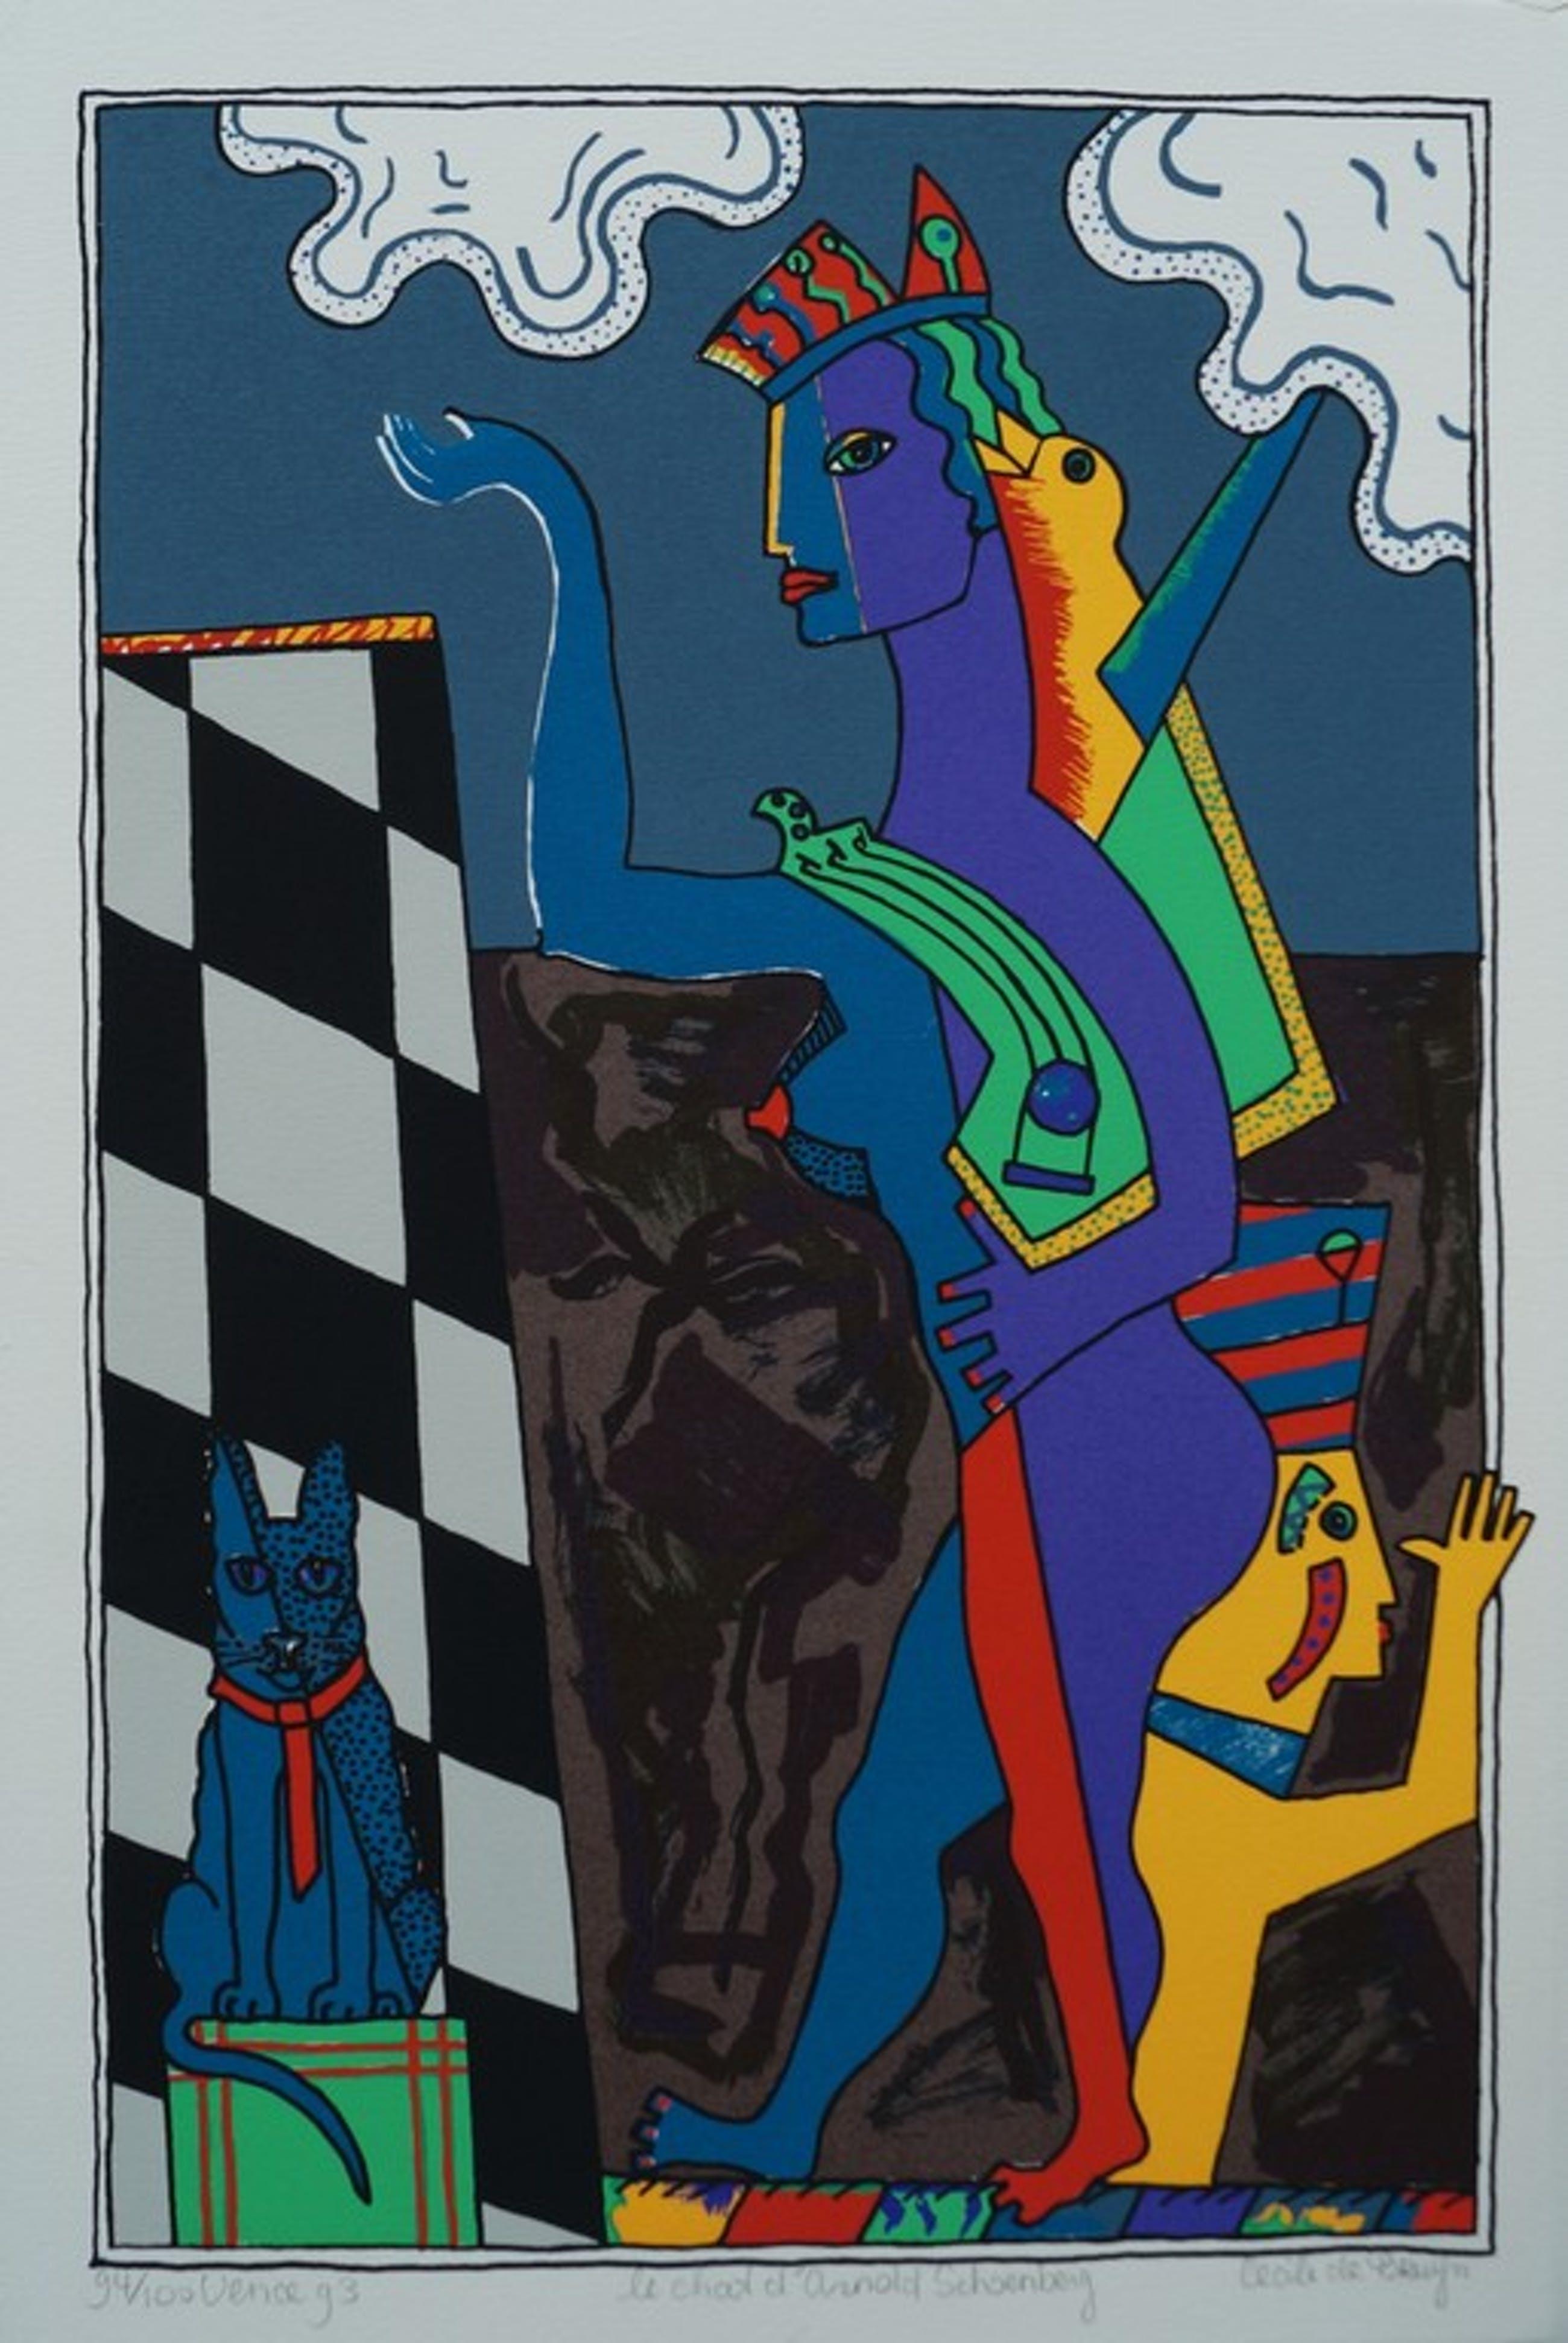 Cecile de Bruijn - Le chat 'd Arnold Schoenberg - 1993 kopen? Bied vanaf 20!